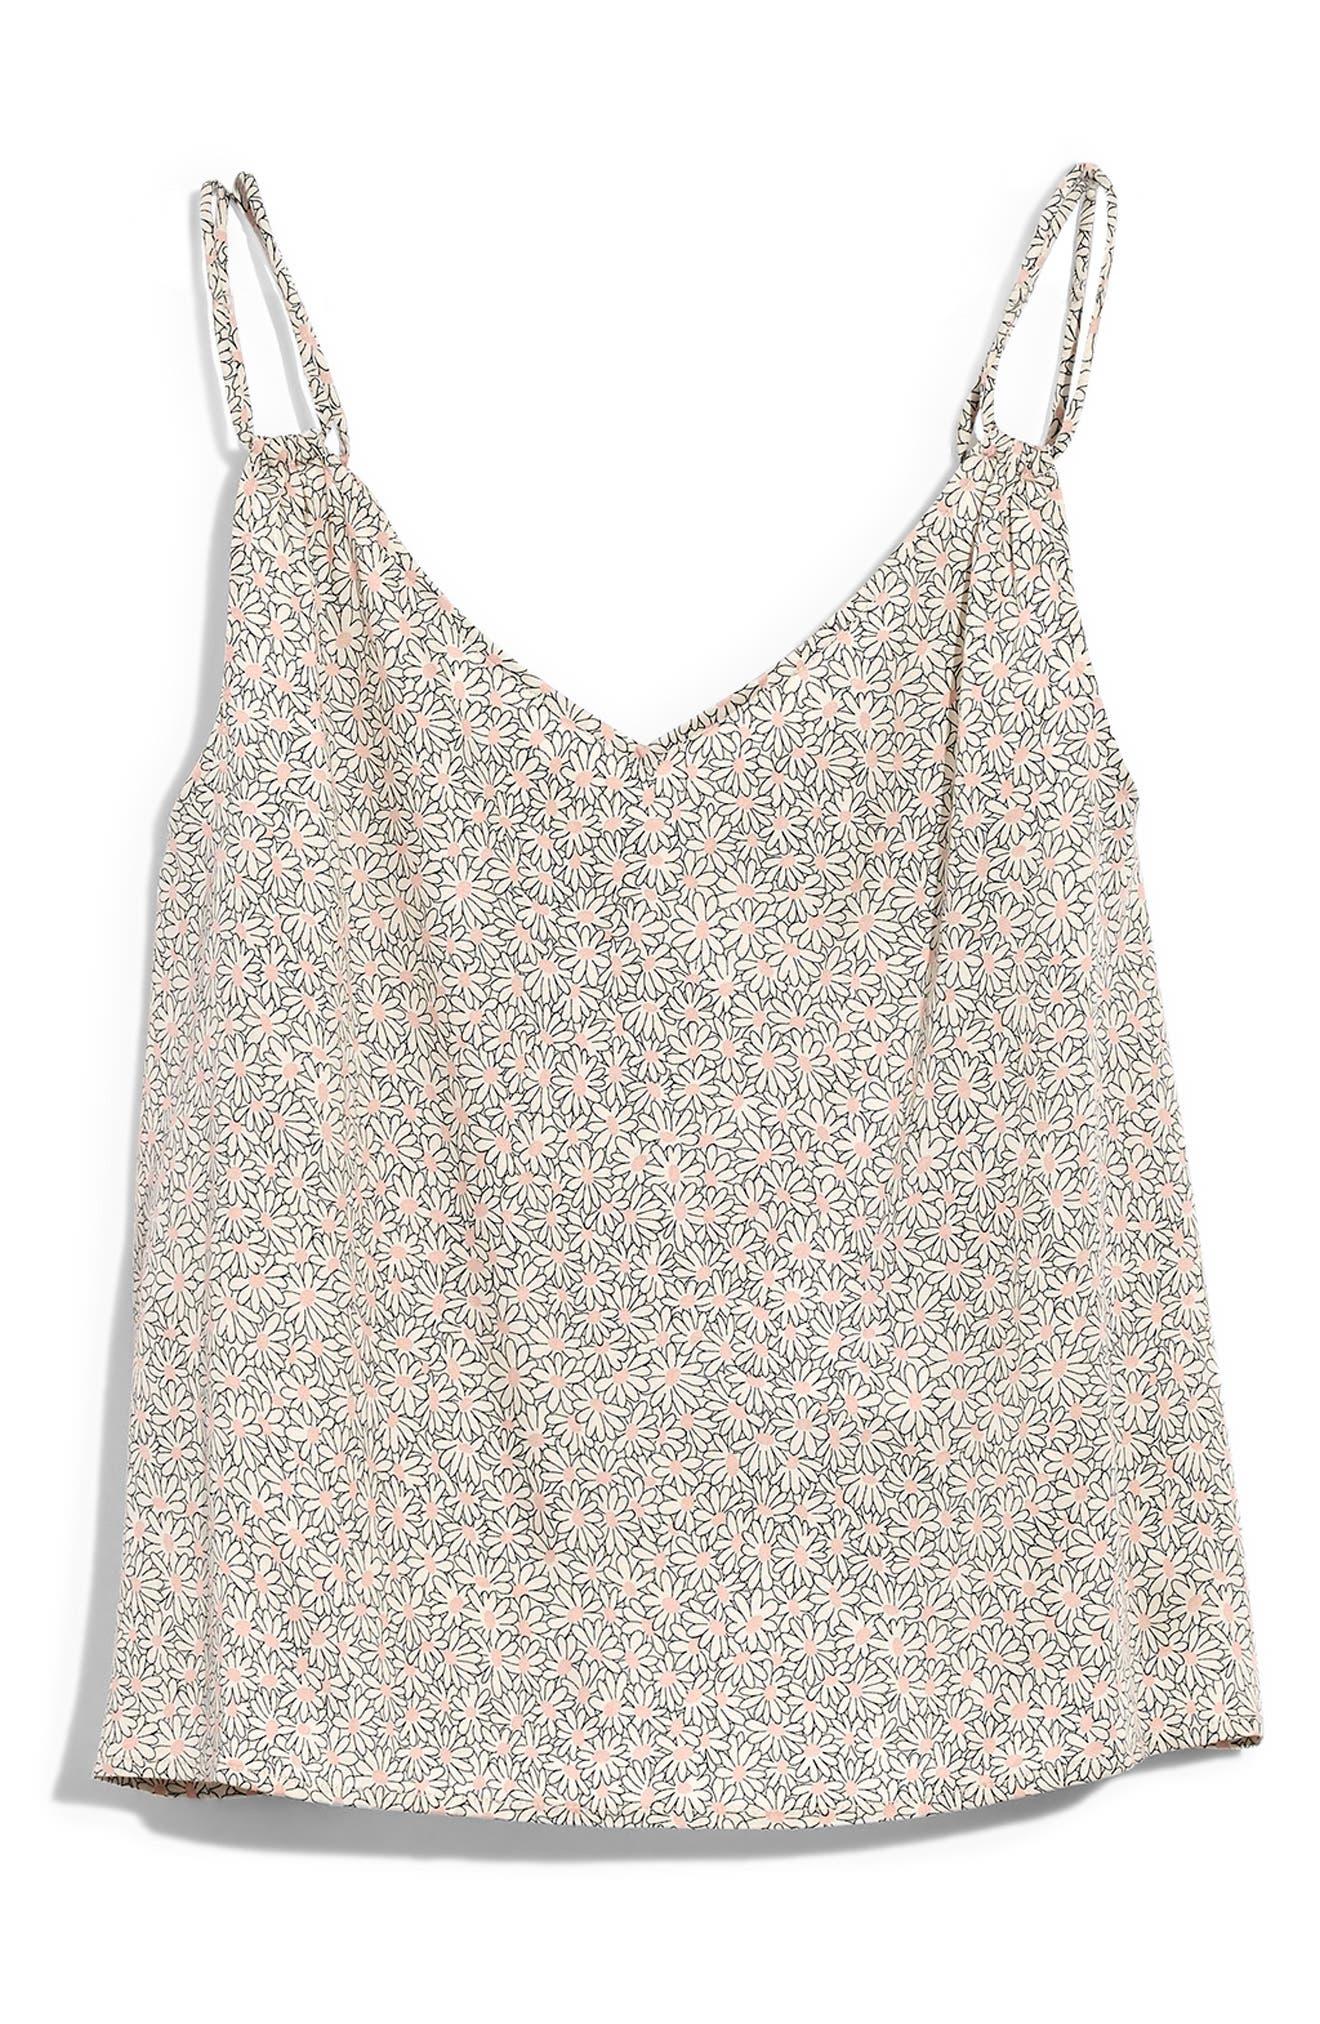 Madewell Daisy Patch Satin Pajama Camisole, Beige